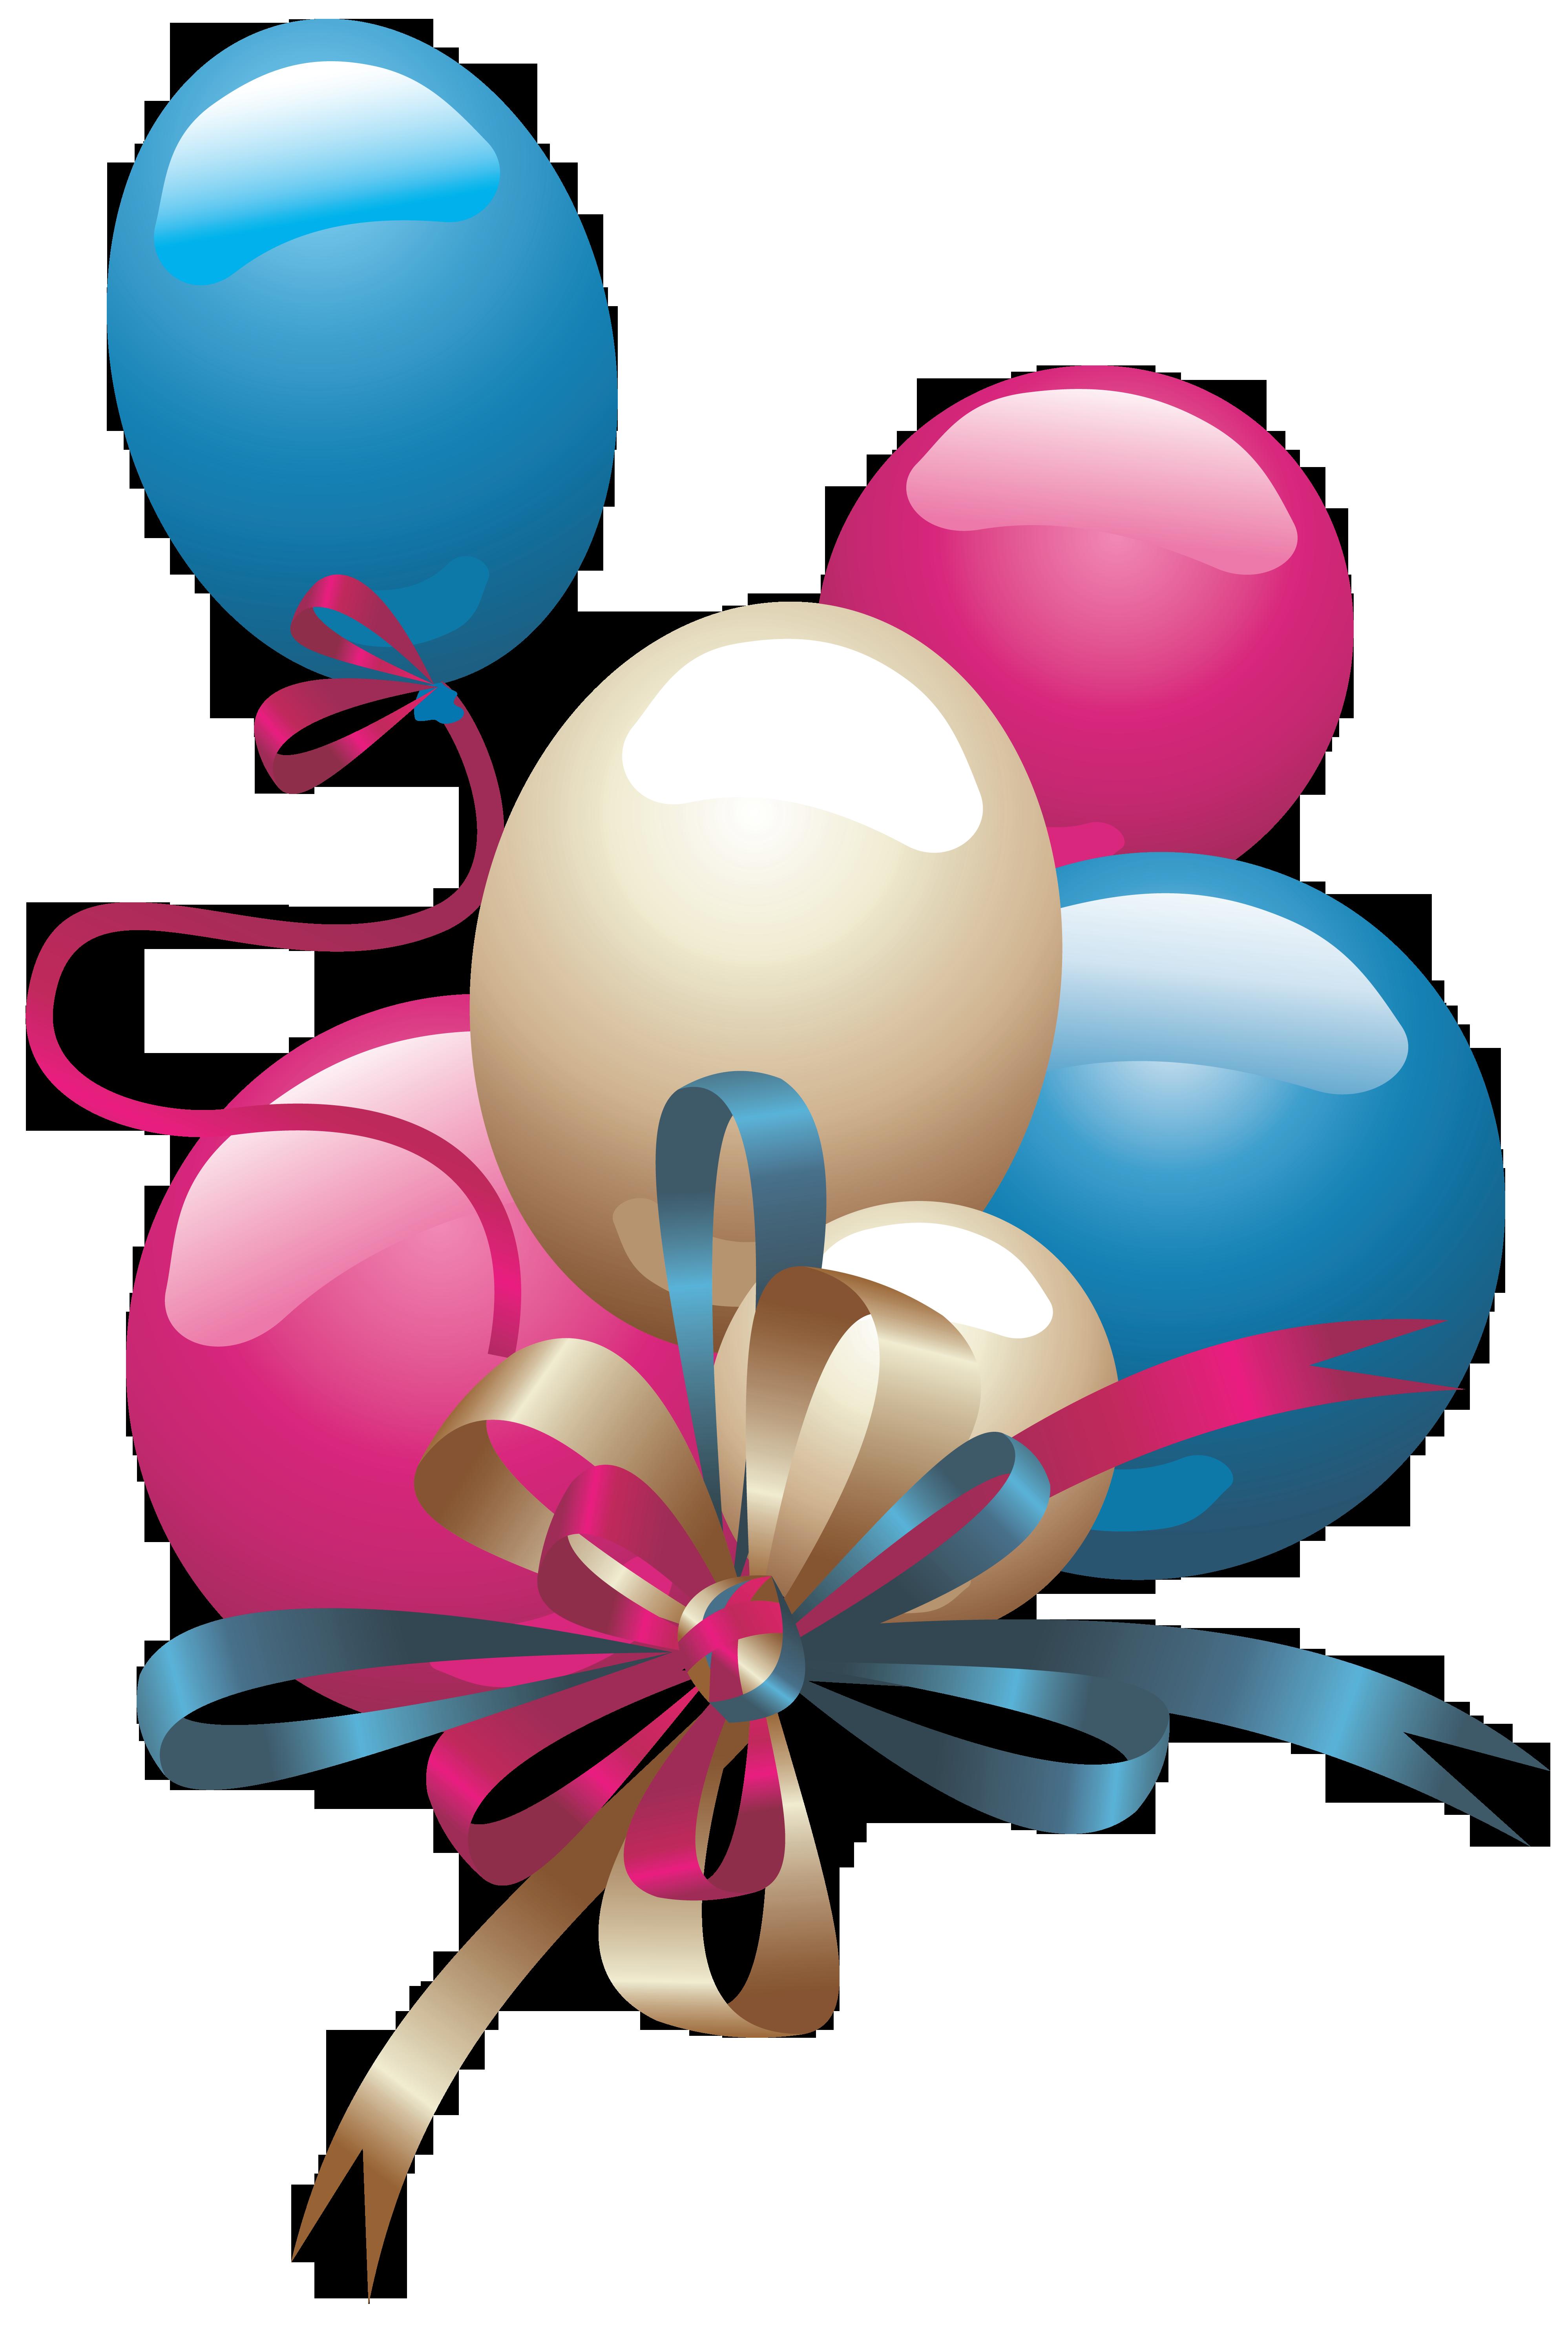 Clipart png balloon. Balloons pinterest cards